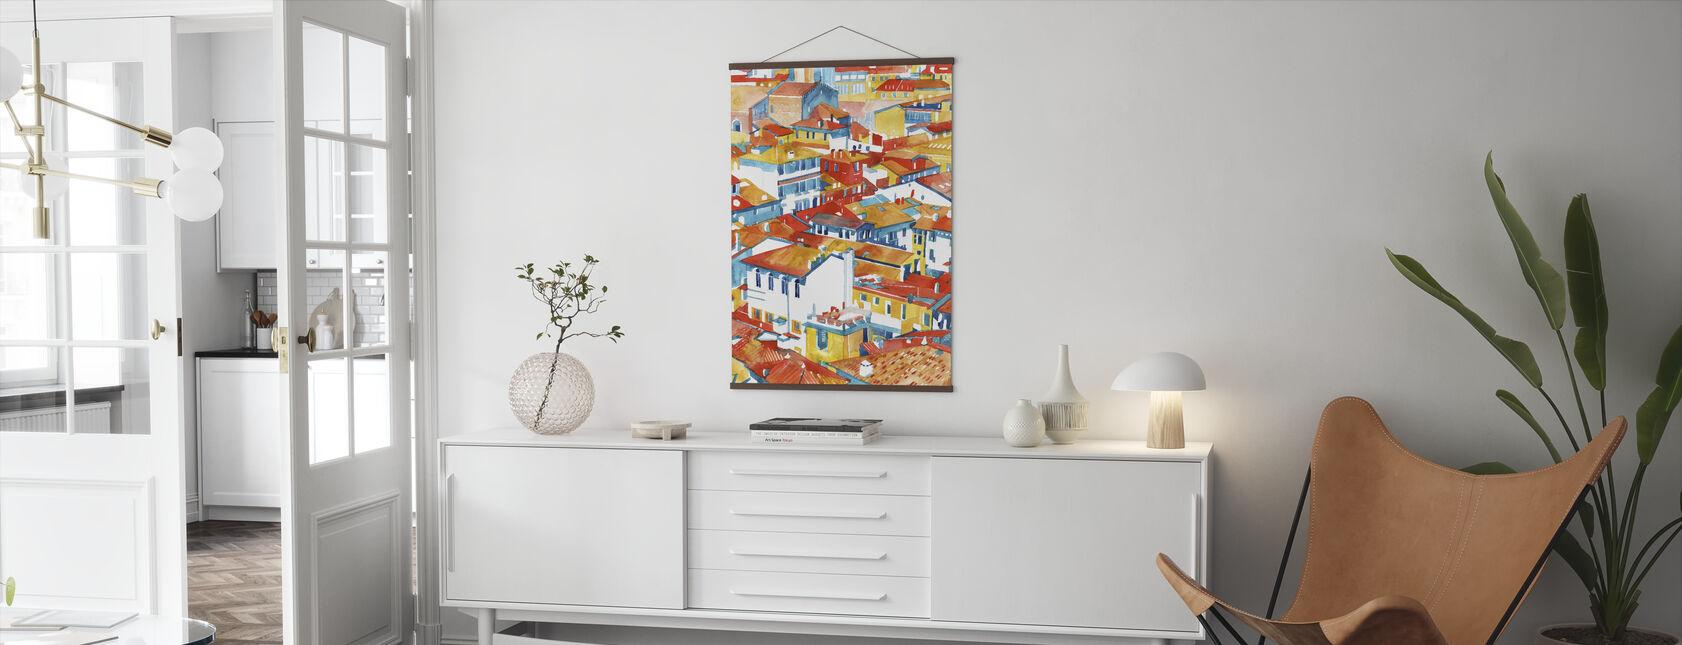 Verona Buildings - Poster - Living Room